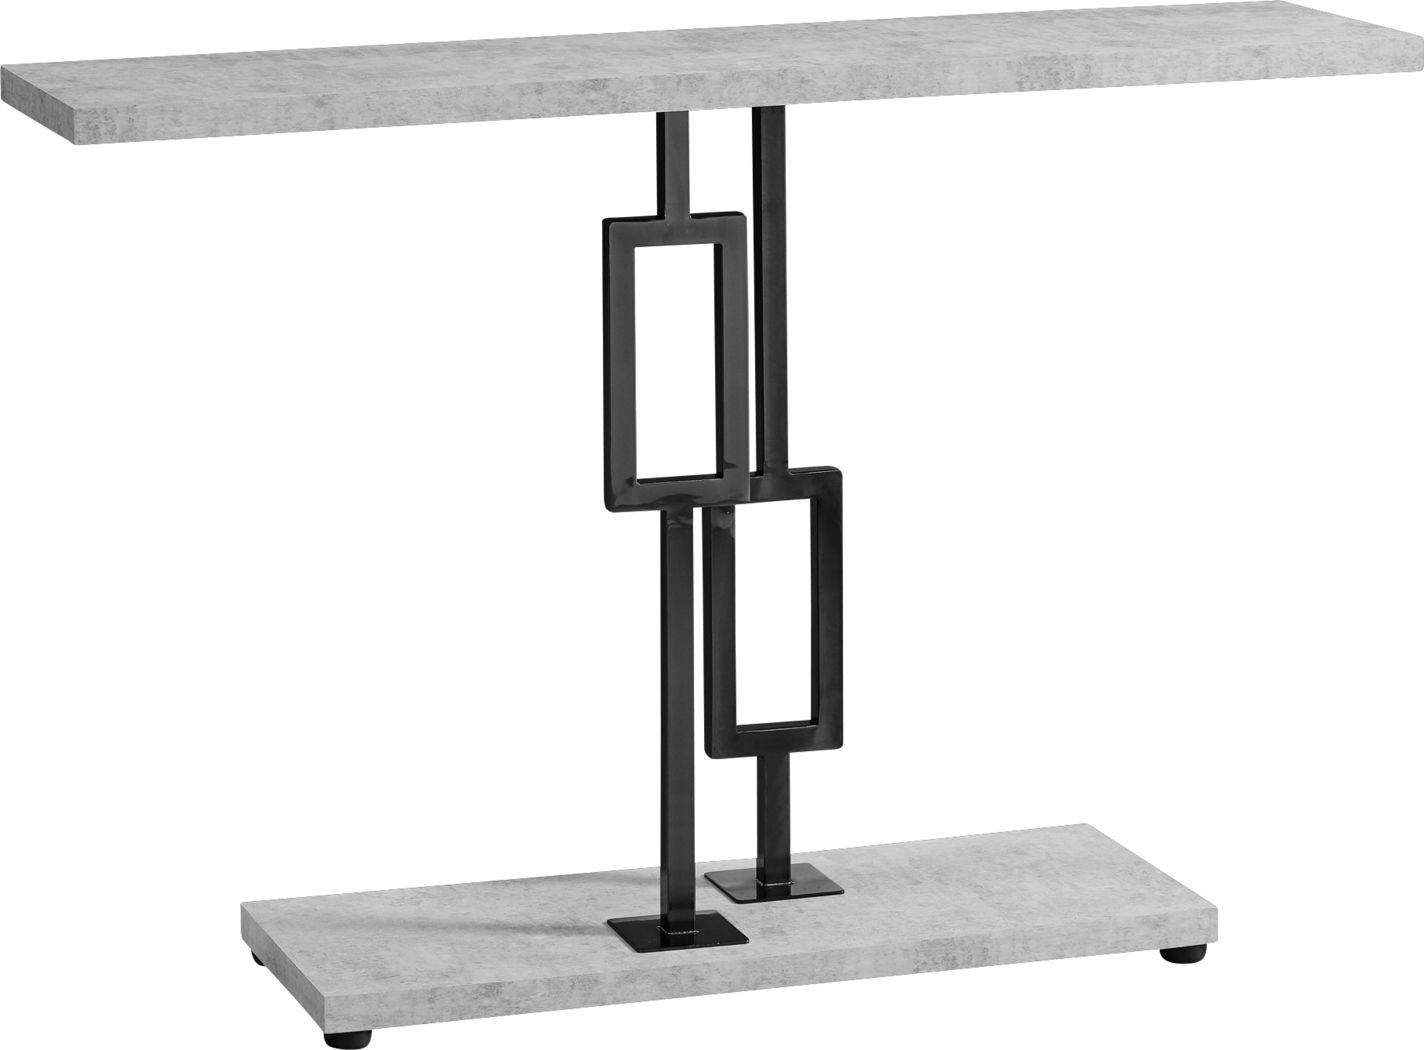 Enloe Gray Console Table